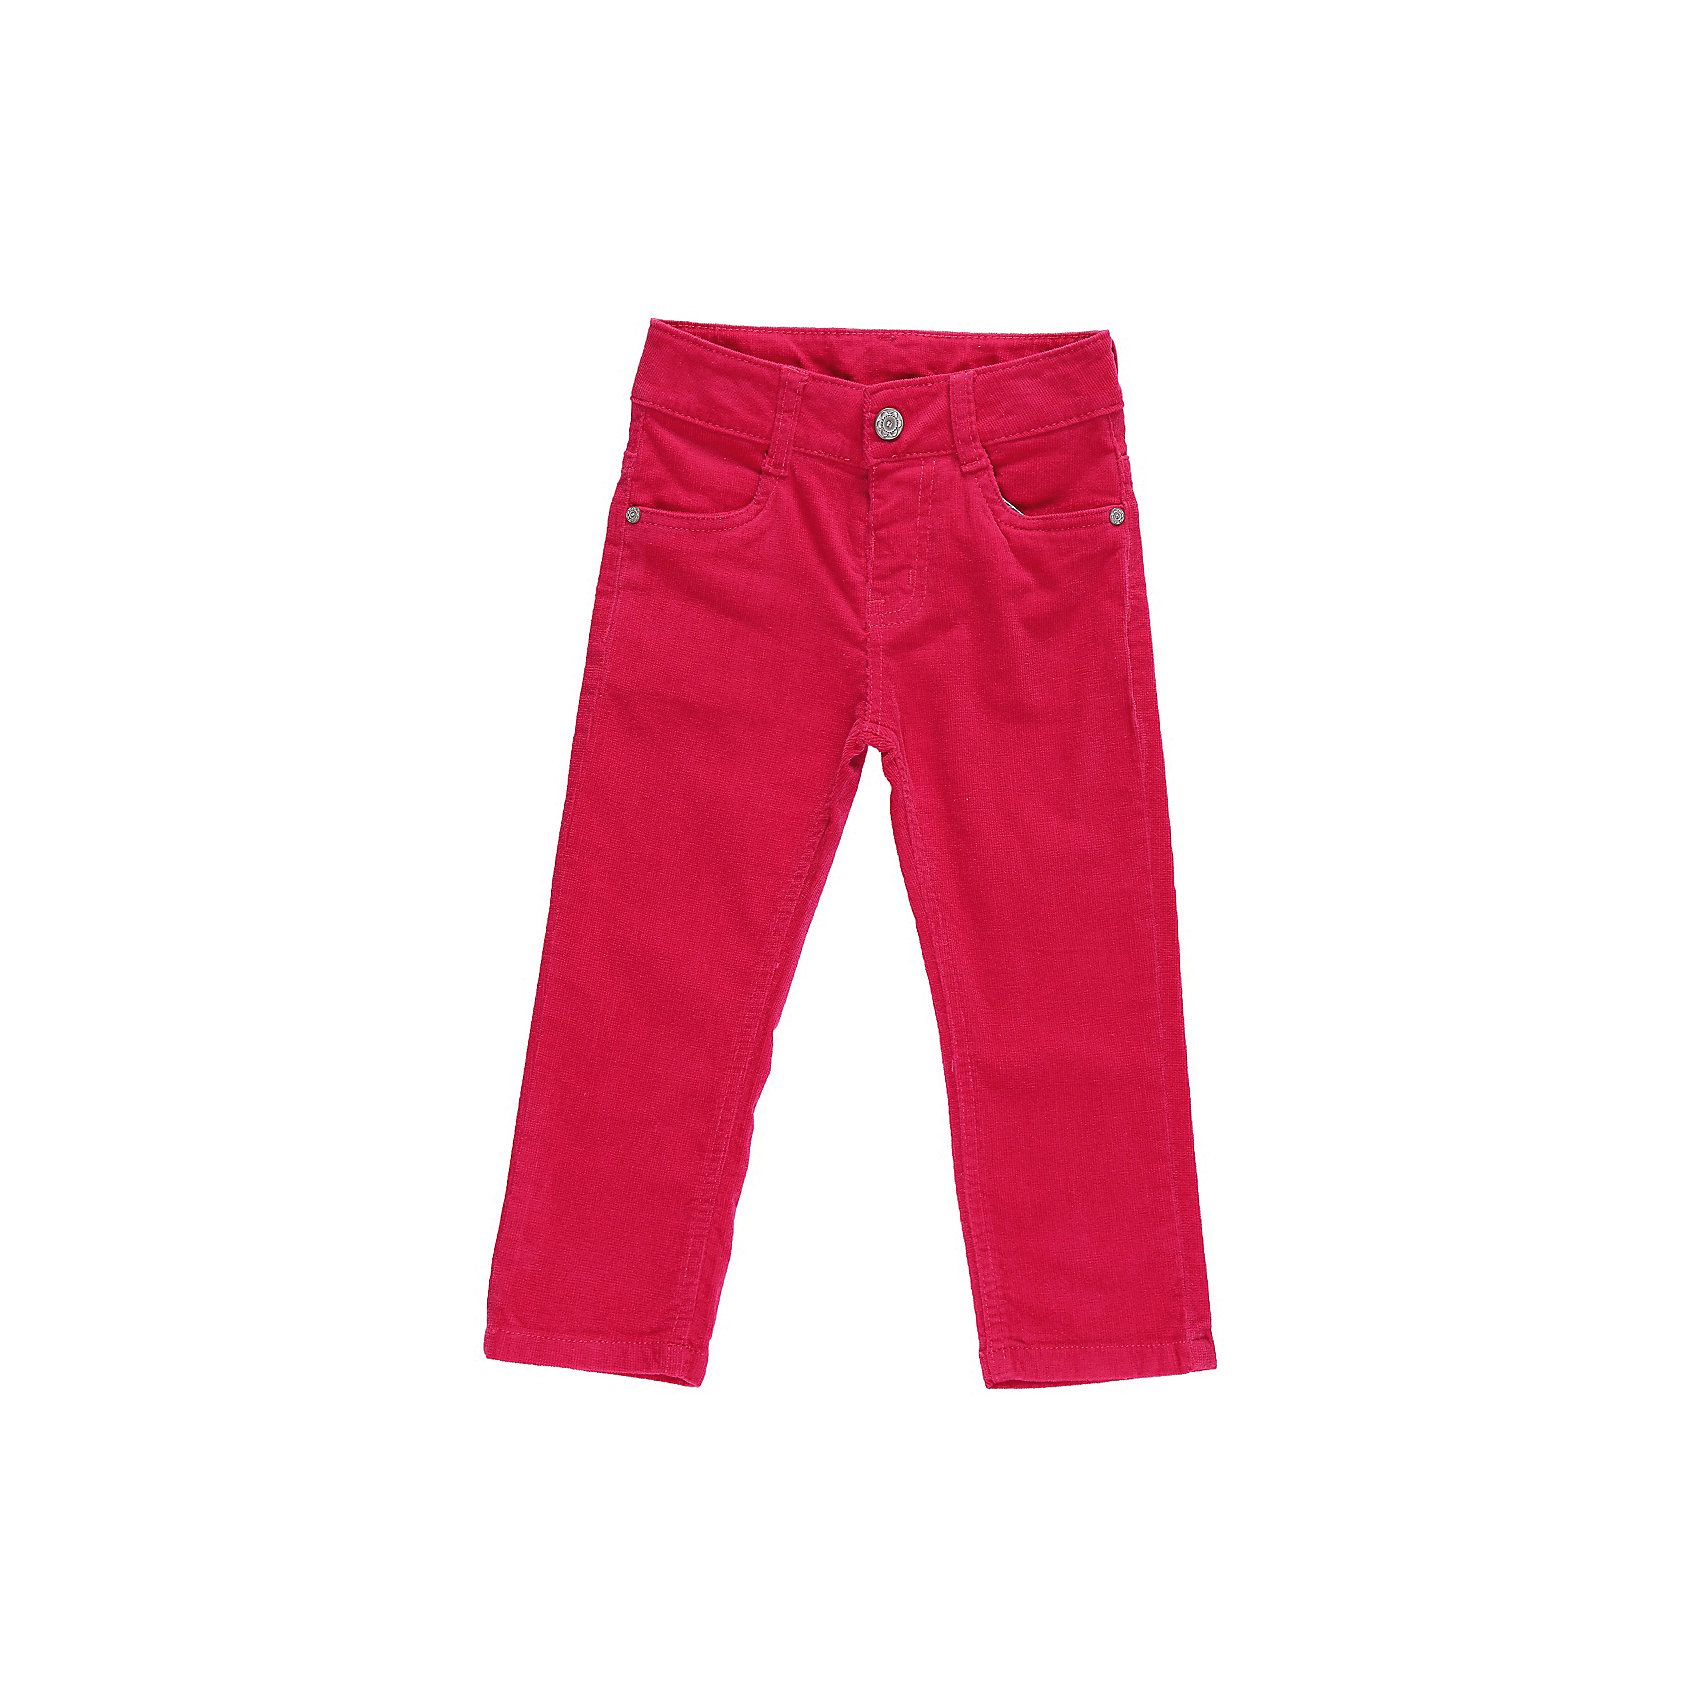 Брюки для девочки Sweet BerryБрюки<br>Вельветовые брюки для девочки с  застежкой - крючком.<br>Состав:<br>98% хлопок, 2% эластан<br><br>Ширина мм: 215<br>Глубина мм: 88<br>Высота мм: 191<br>Вес г: 336<br>Цвет: бордовый<br>Возраст от месяцев: 9<br>Возраст до месяцев: 12<br>Пол: Женский<br>Возраст: Детский<br>Размер: 80,98,86,92<br>SKU: 4520528